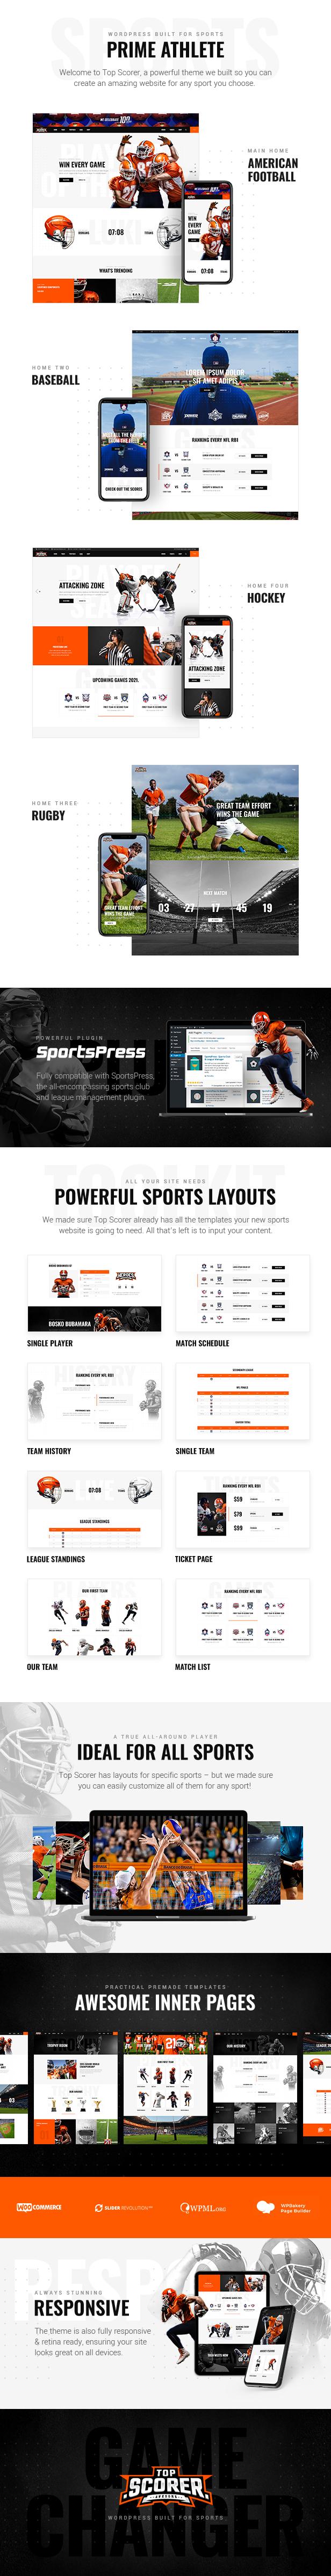 TopScorer - Sports WordPress Theme - 1